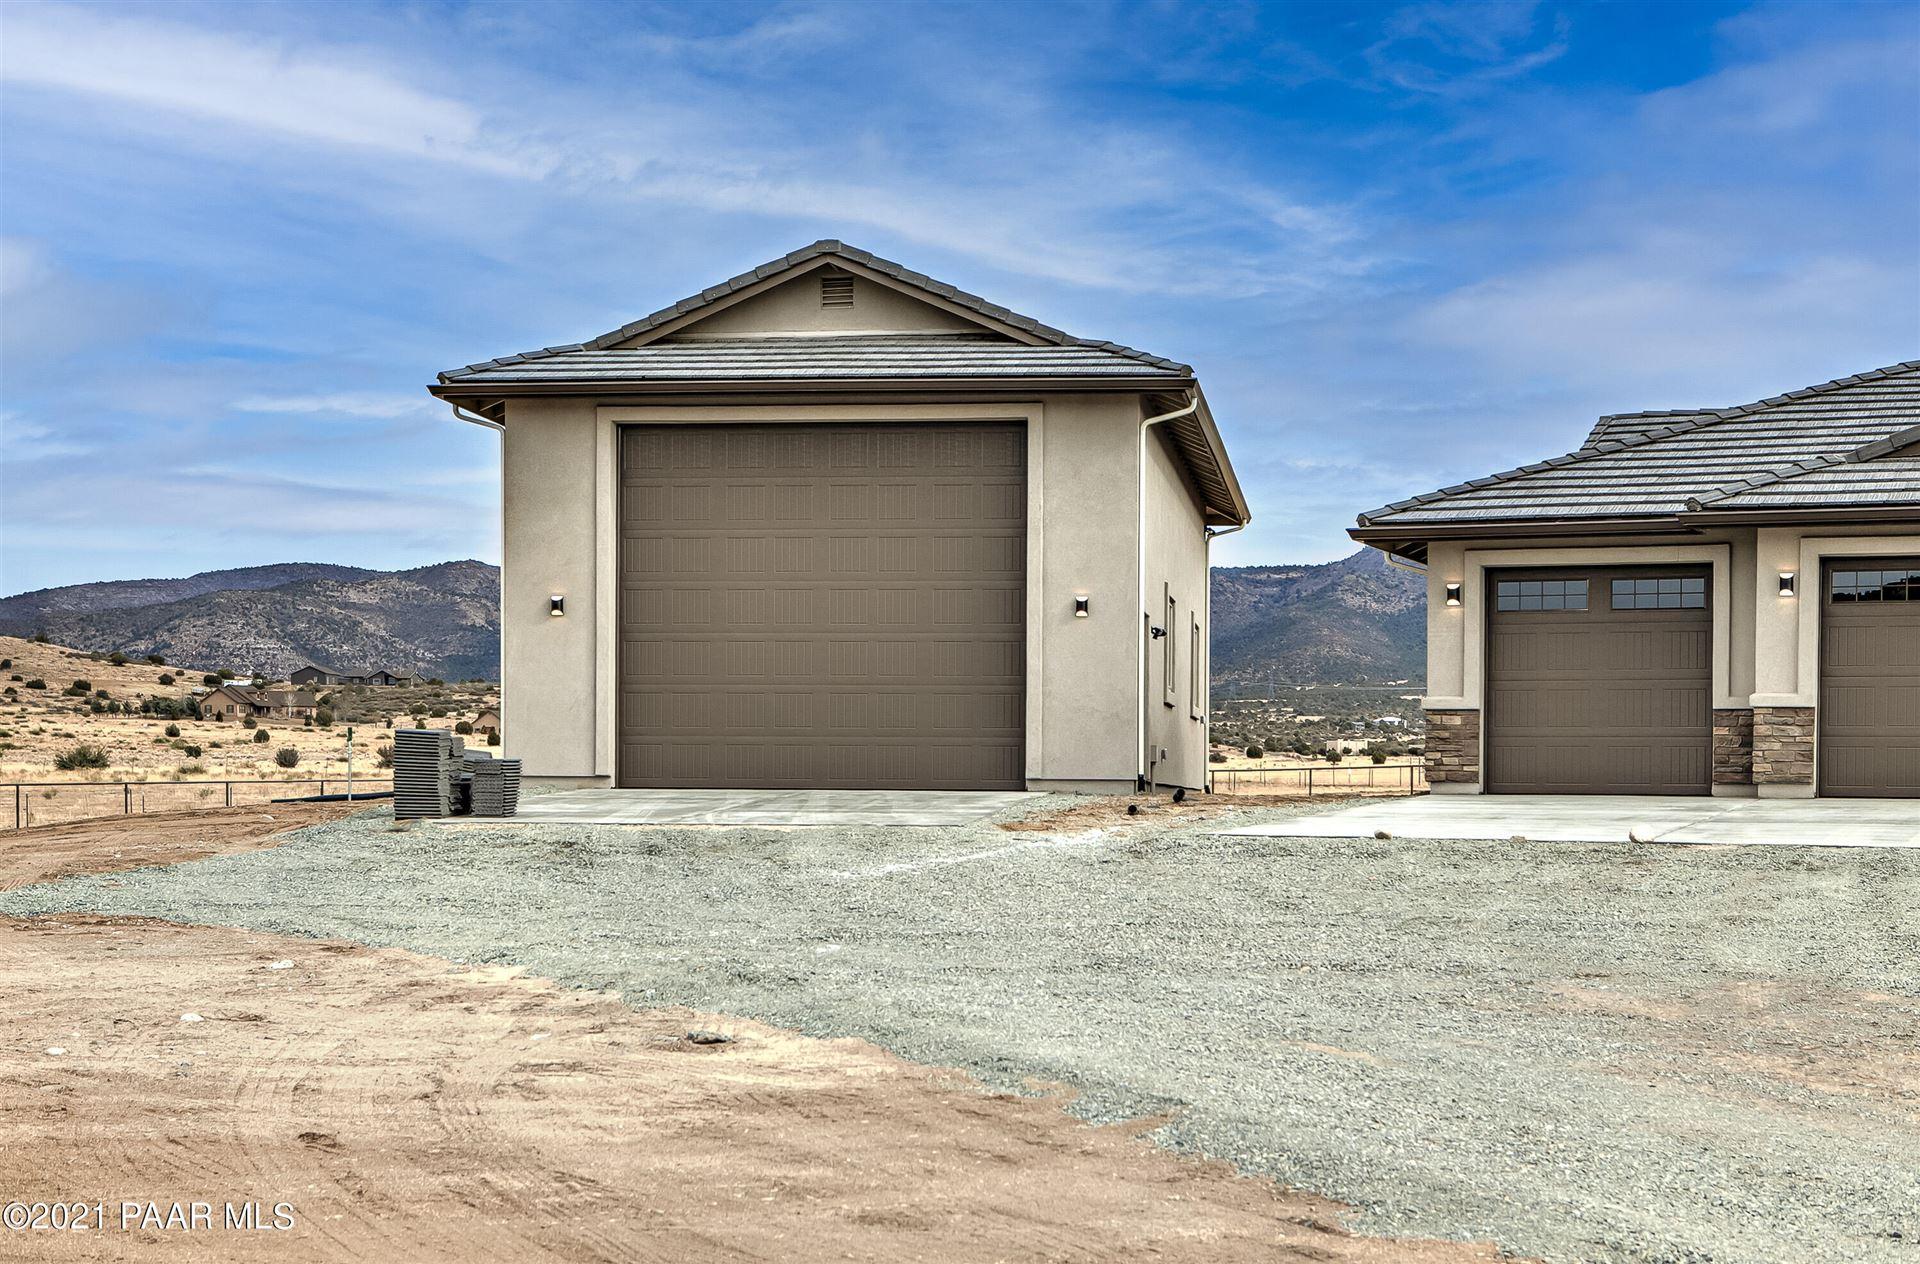 Photo of 9965 N Martingale Way, Prescott Valley, AZ 86315 (MLS # 1040492)